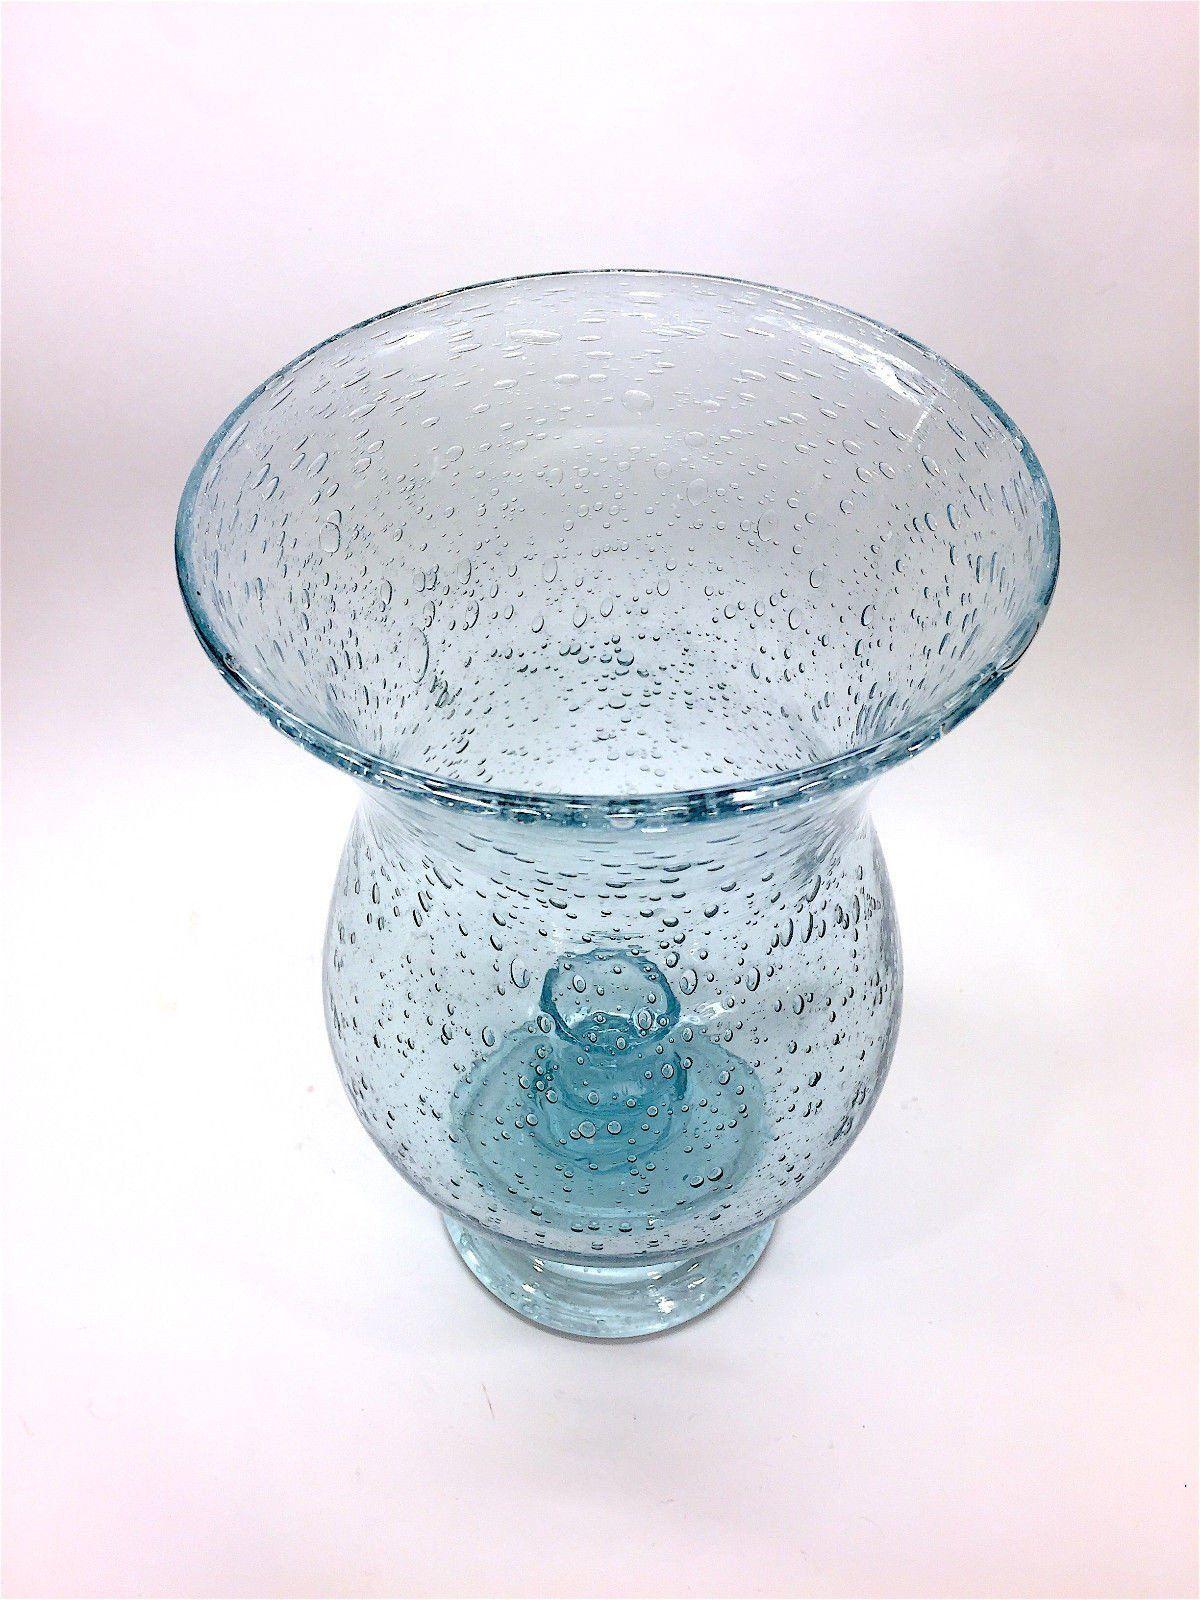 Verrerie De Biot France Aqua Blue Bubble Glass Hurricane Lamp